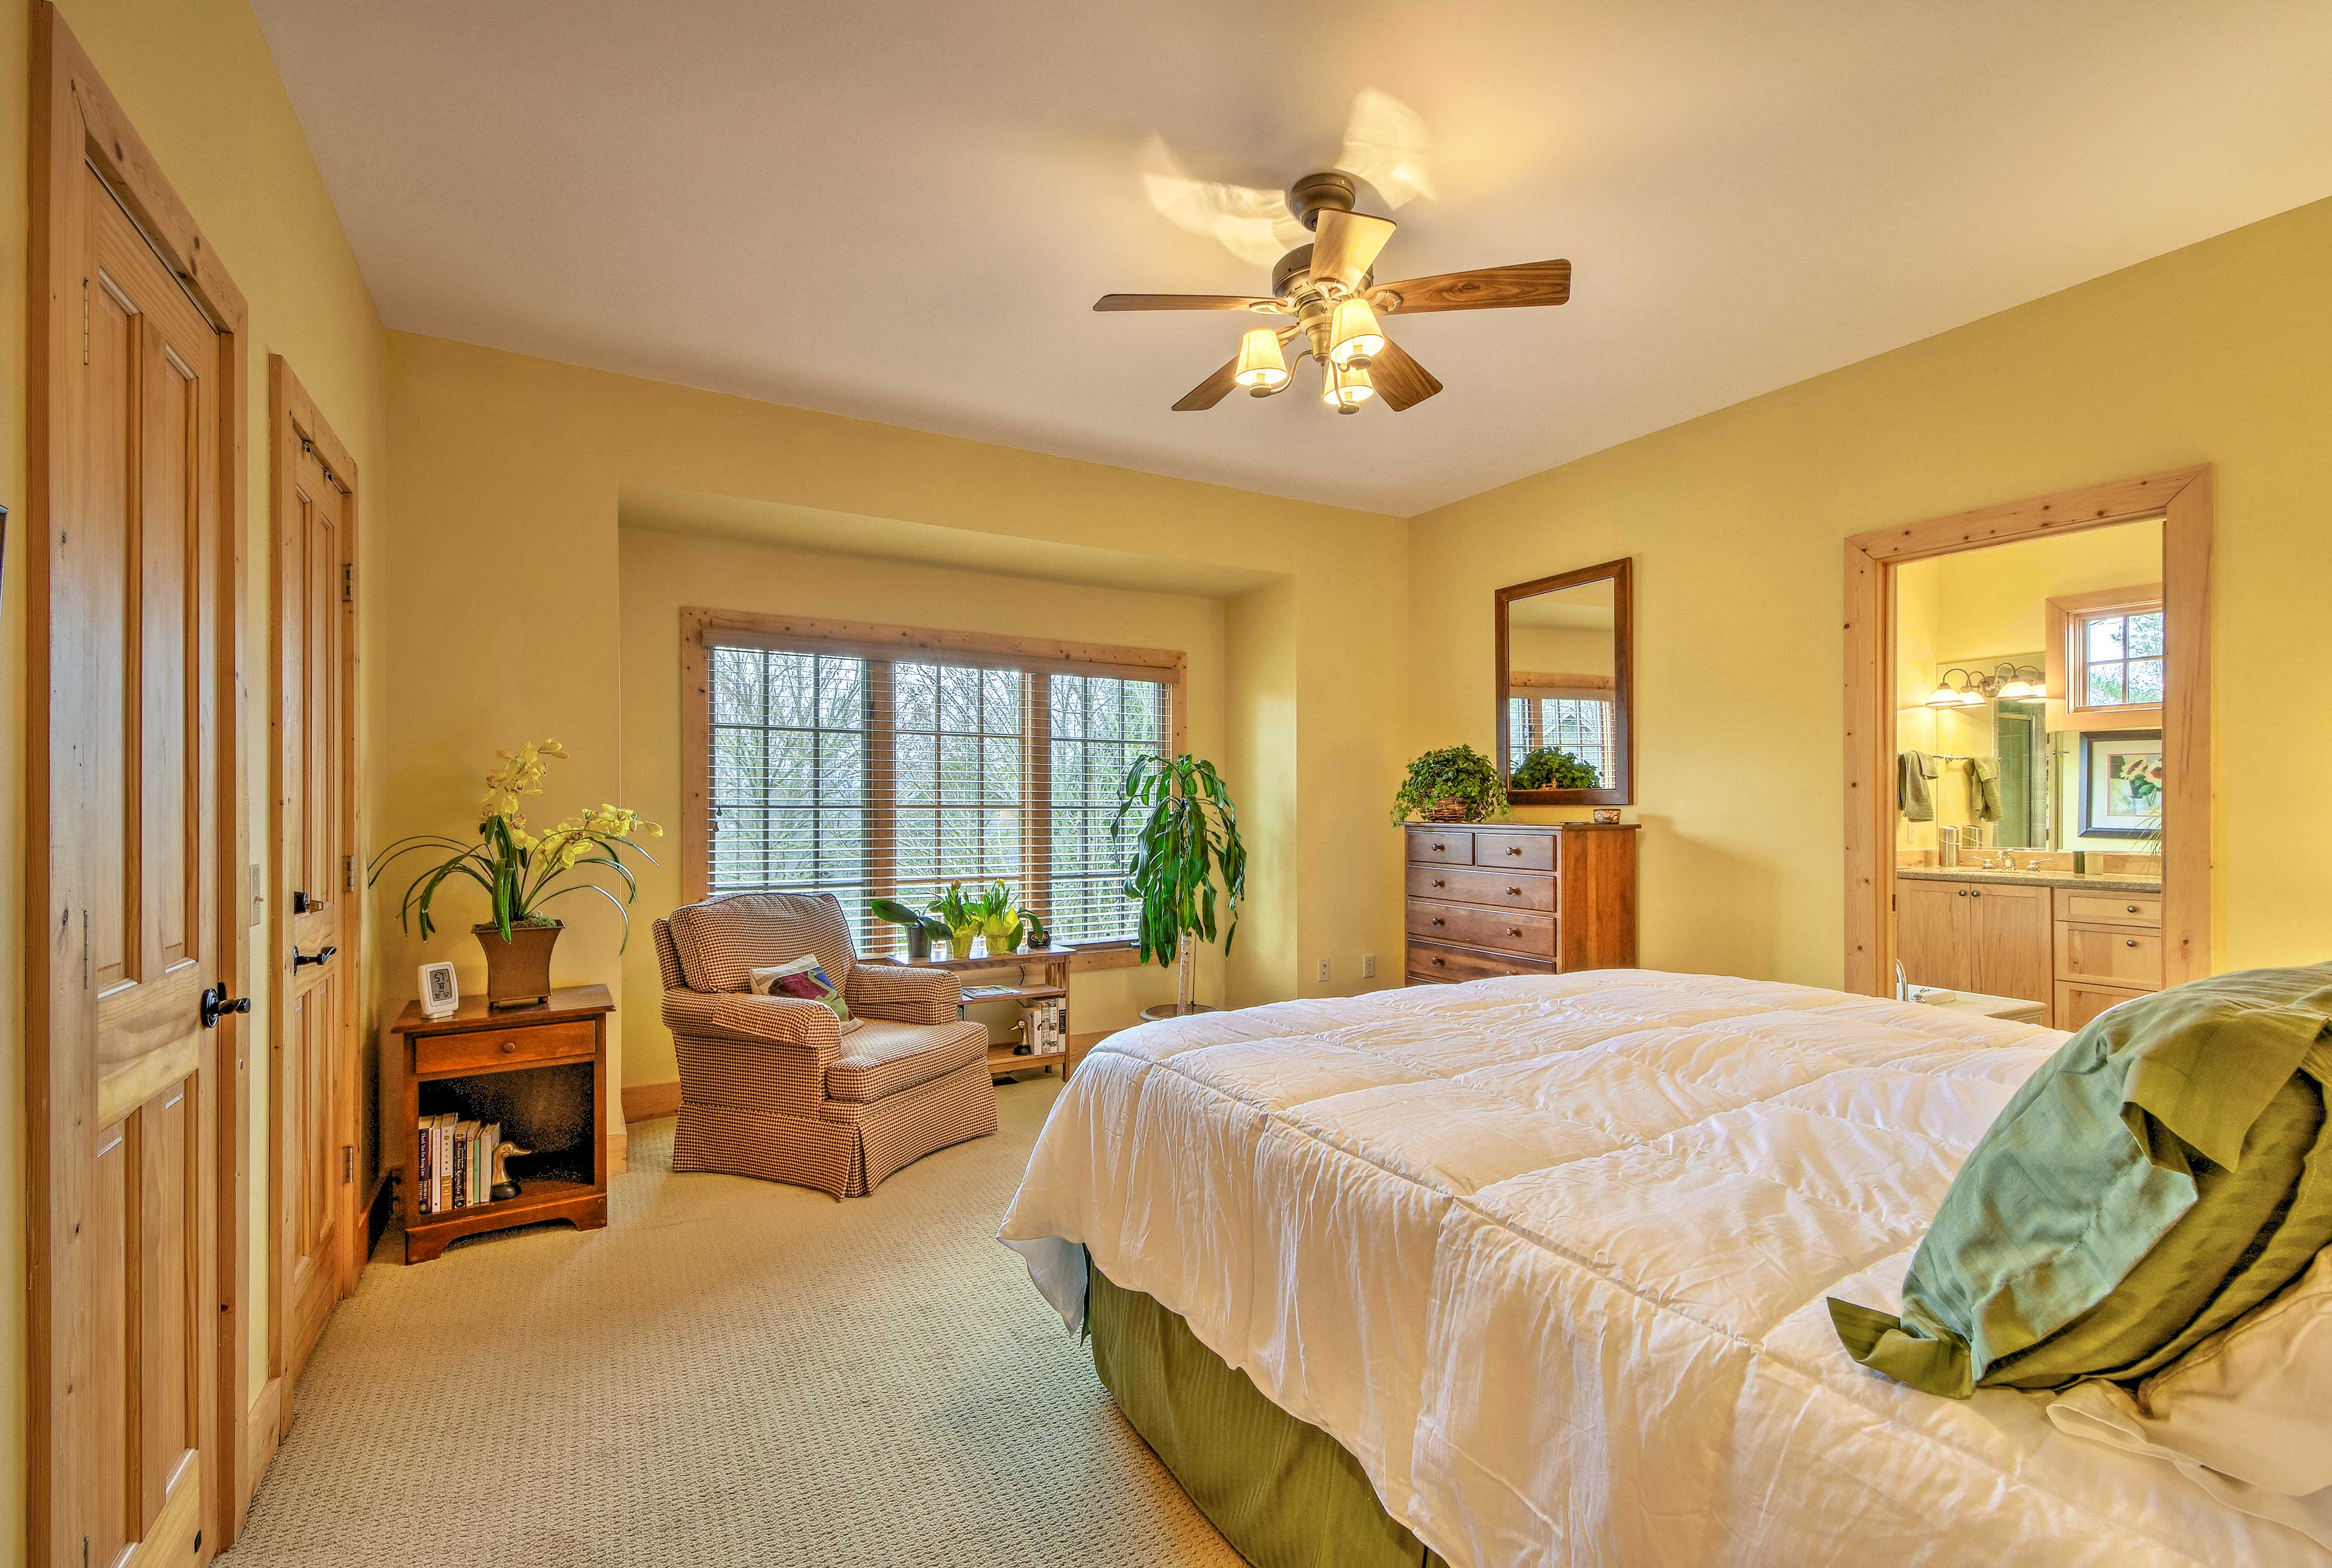 Bedroom 1 | Linens Provided | En-Suite Bathroom